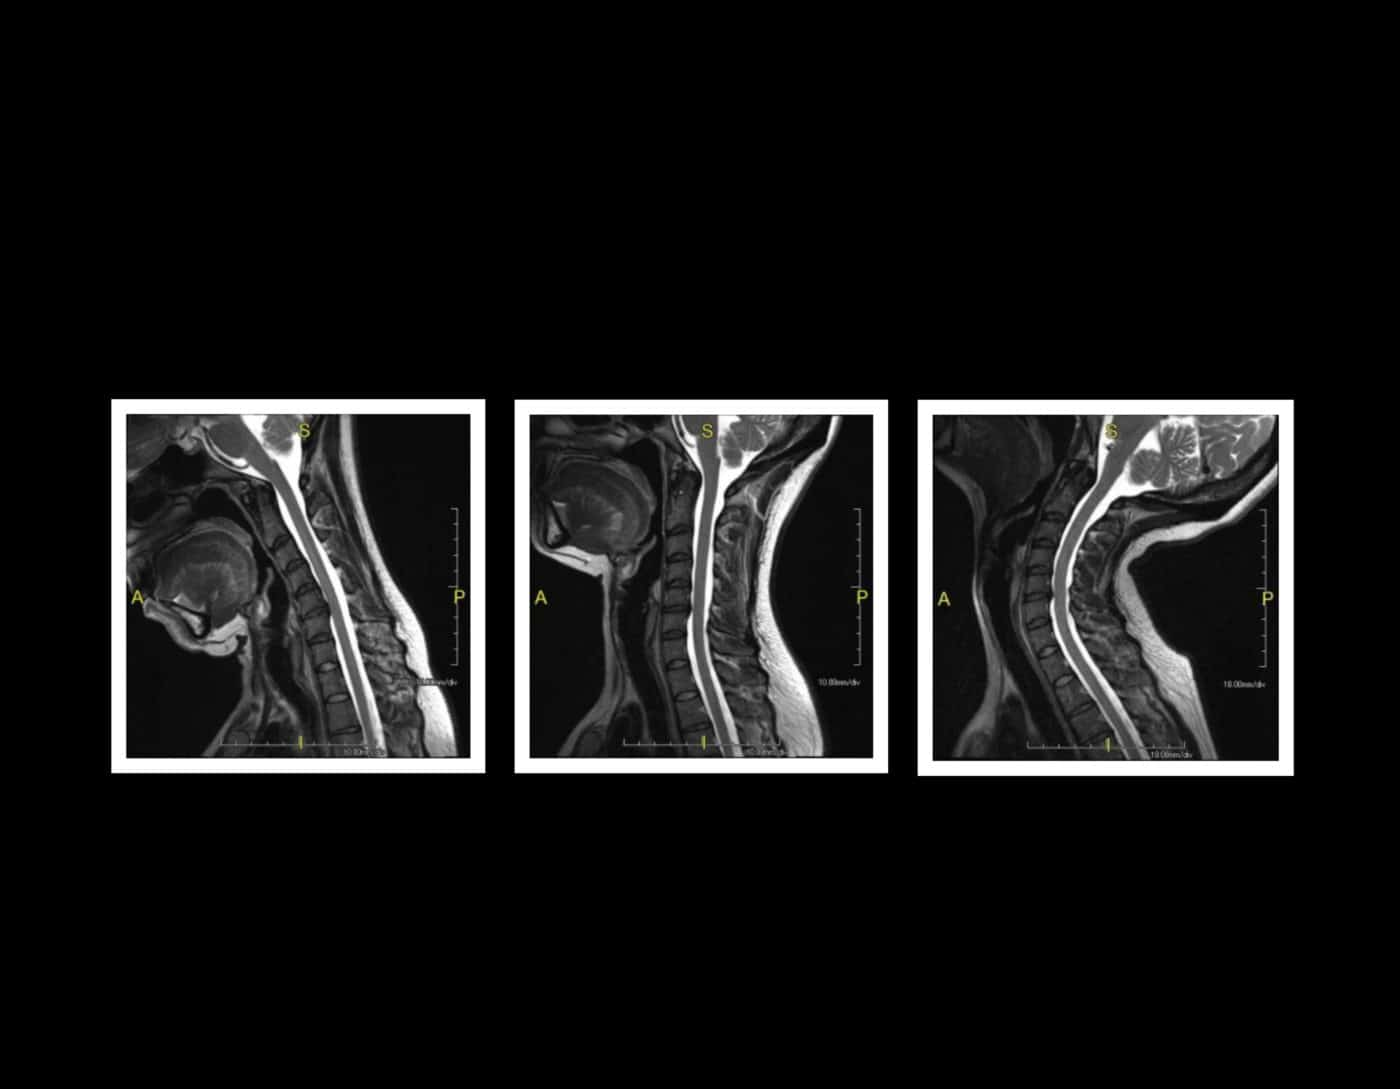 Dynamic (Animated) 3T MRI